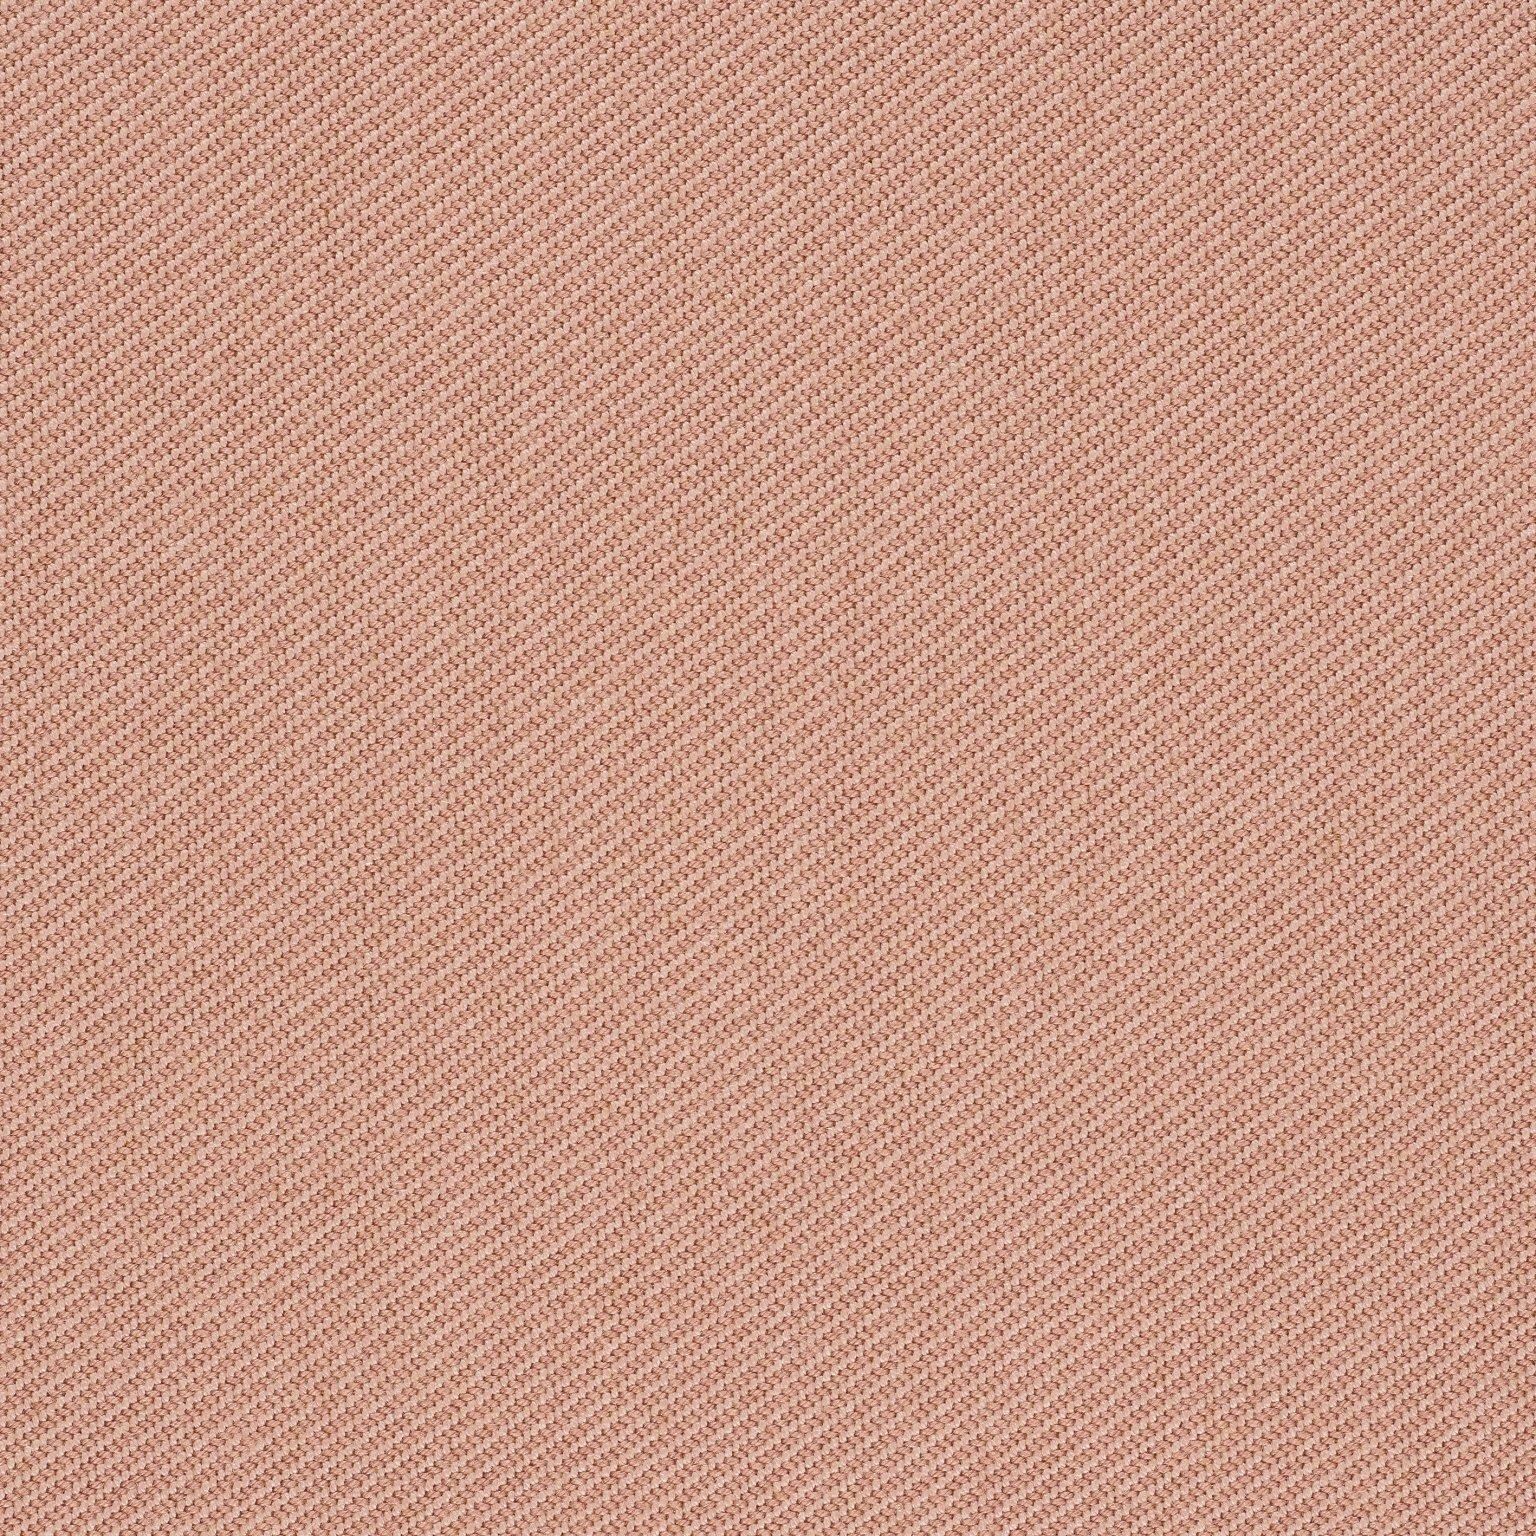 Kvadrat > Twill Weave 0530